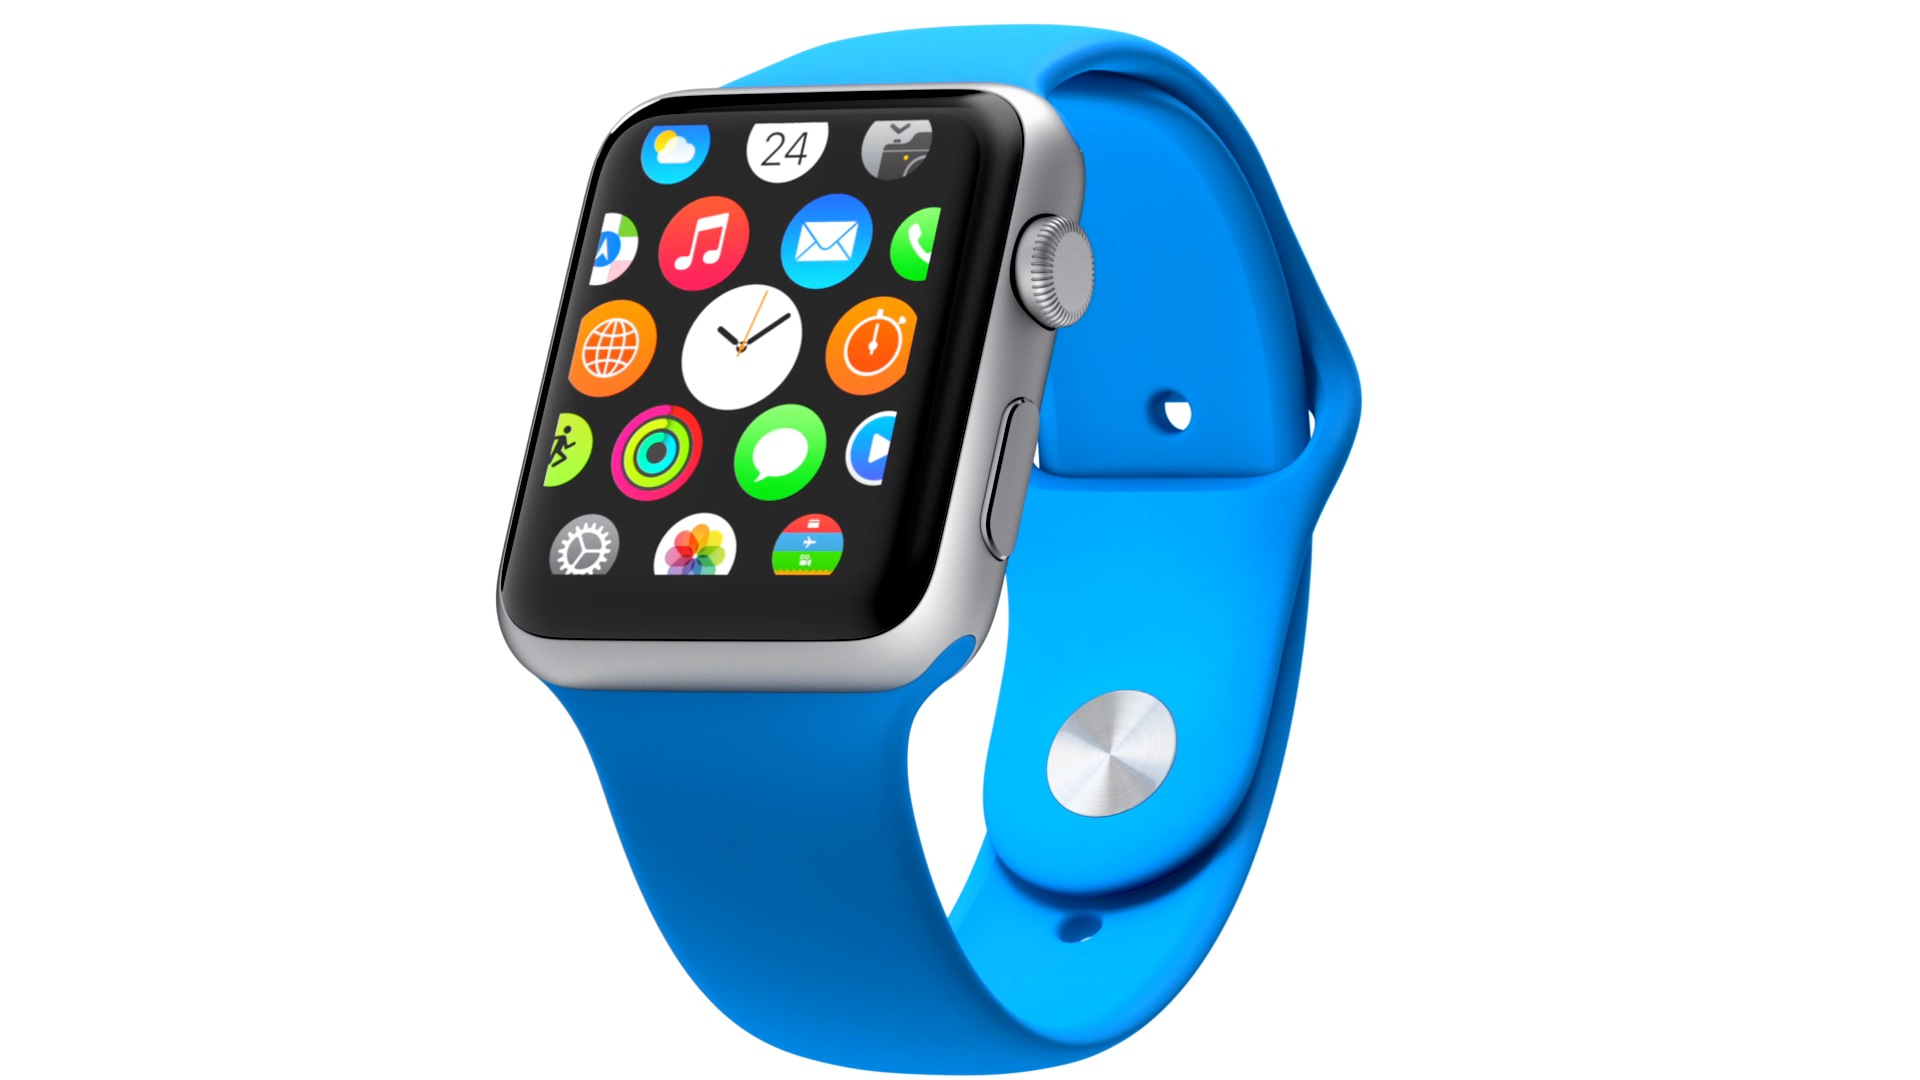 Ulefone uWear smartwatch, competing an Apple Watch?